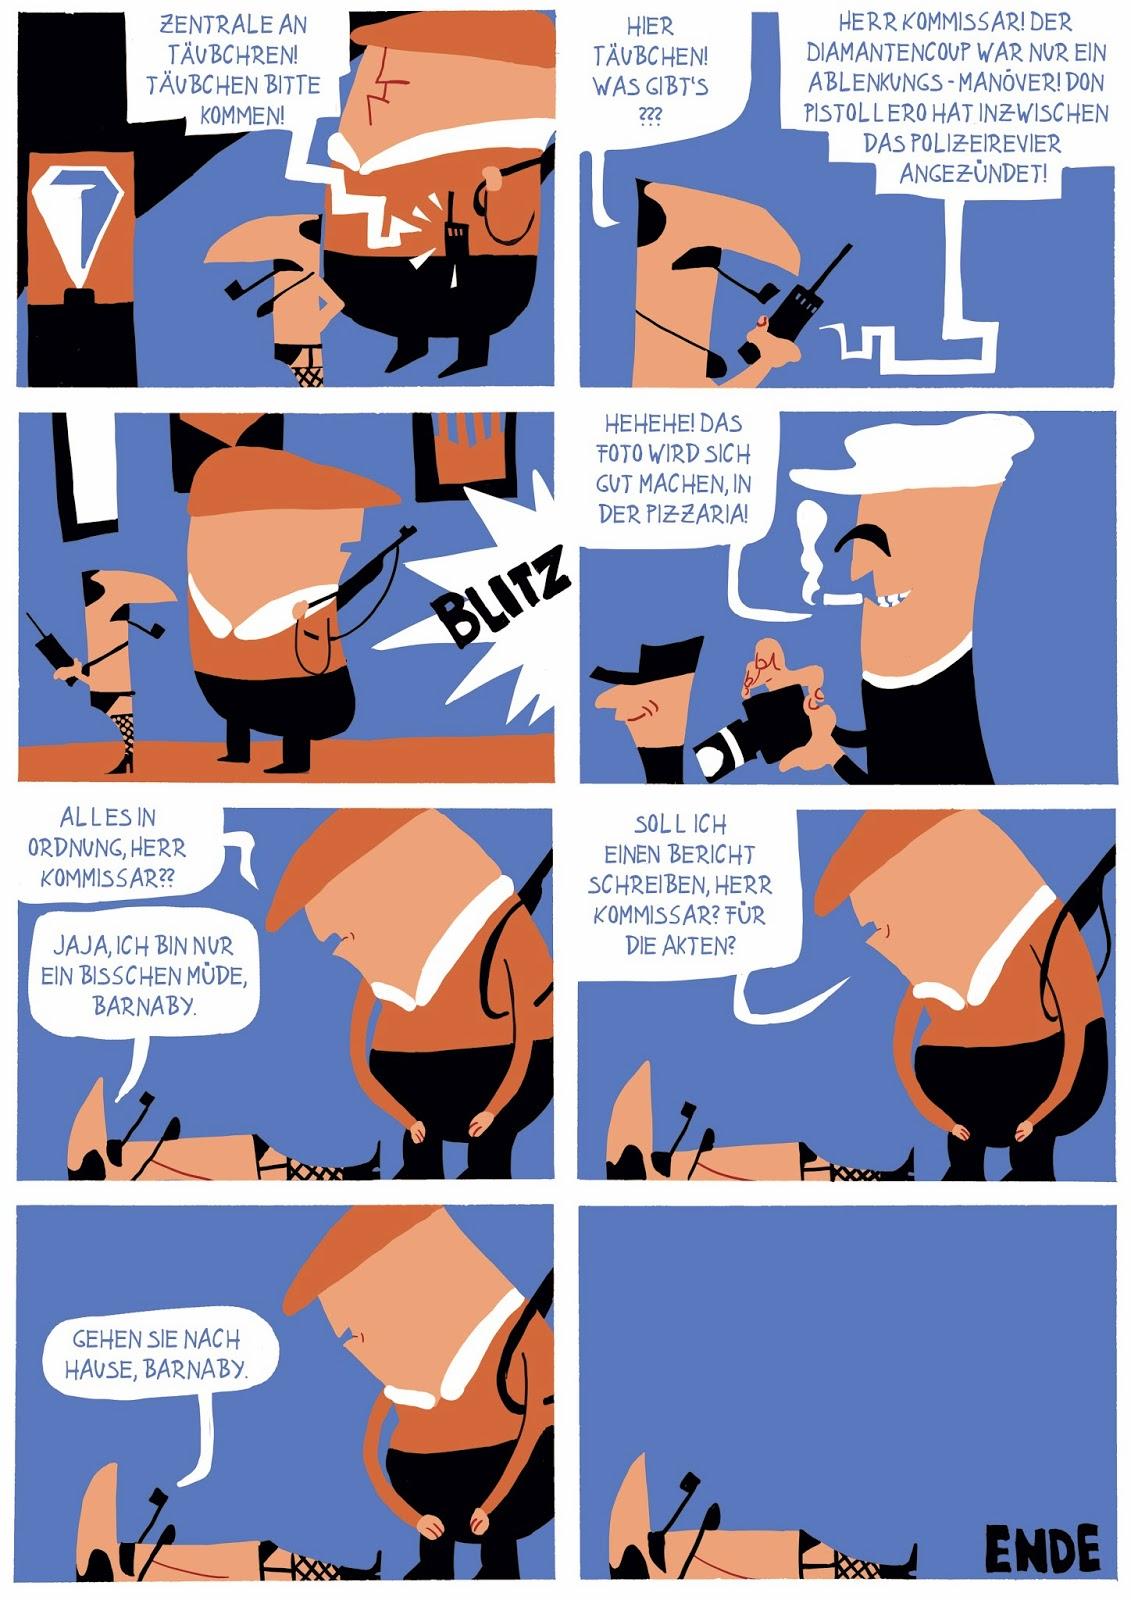 kommissar, inspektor, mafia, humor, jpeg